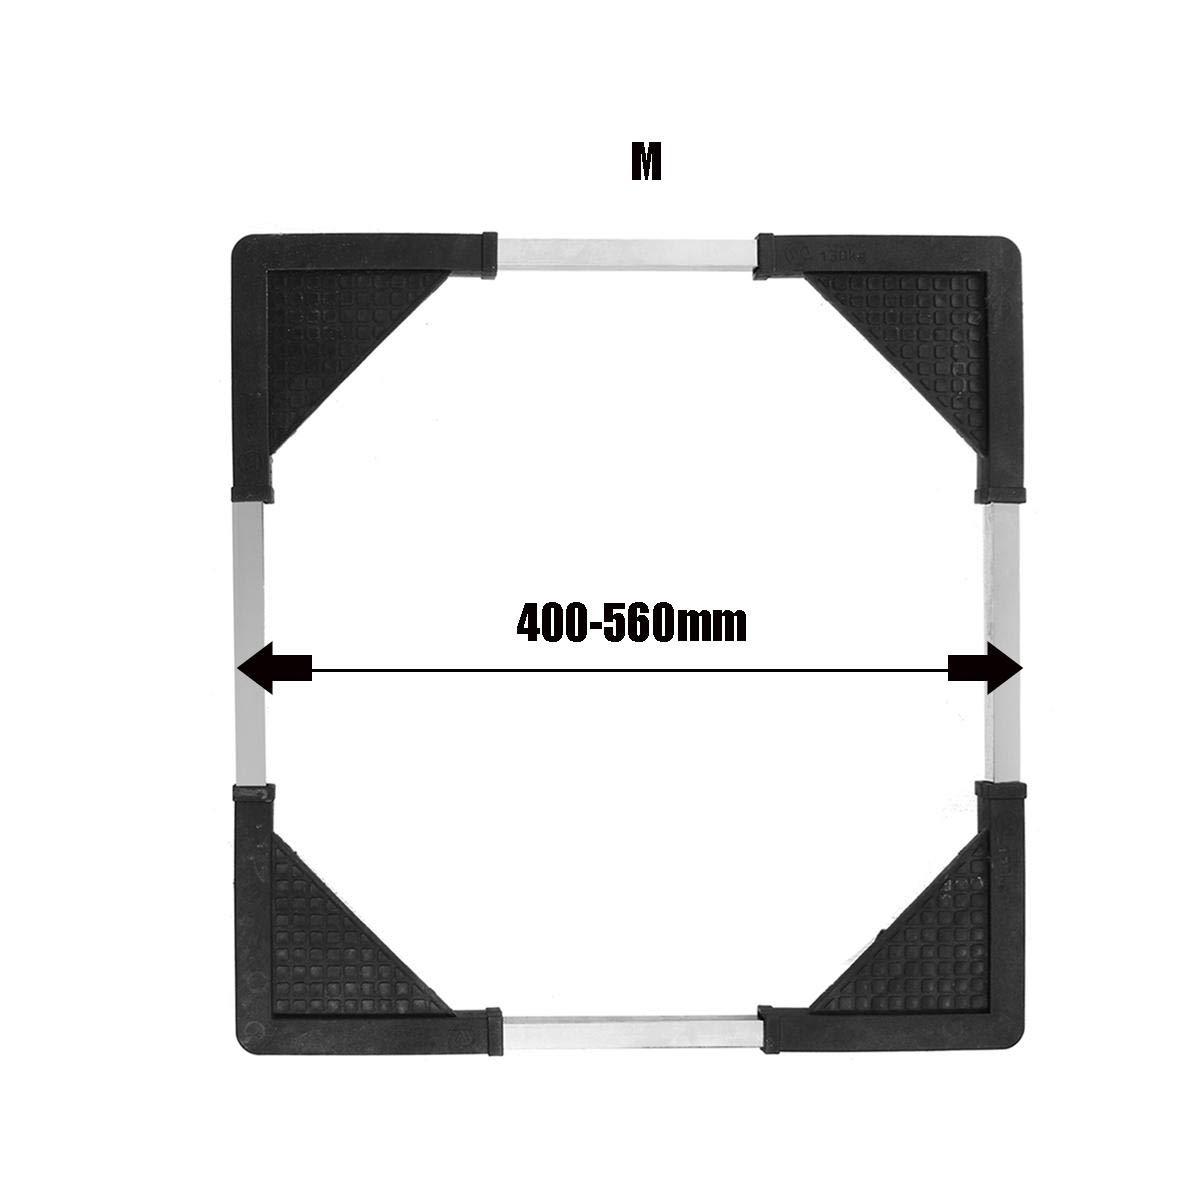 Appliances Base Washing Machine Refrigerator Heighten Frame Stainless Steel Moveable Base Bracket - M